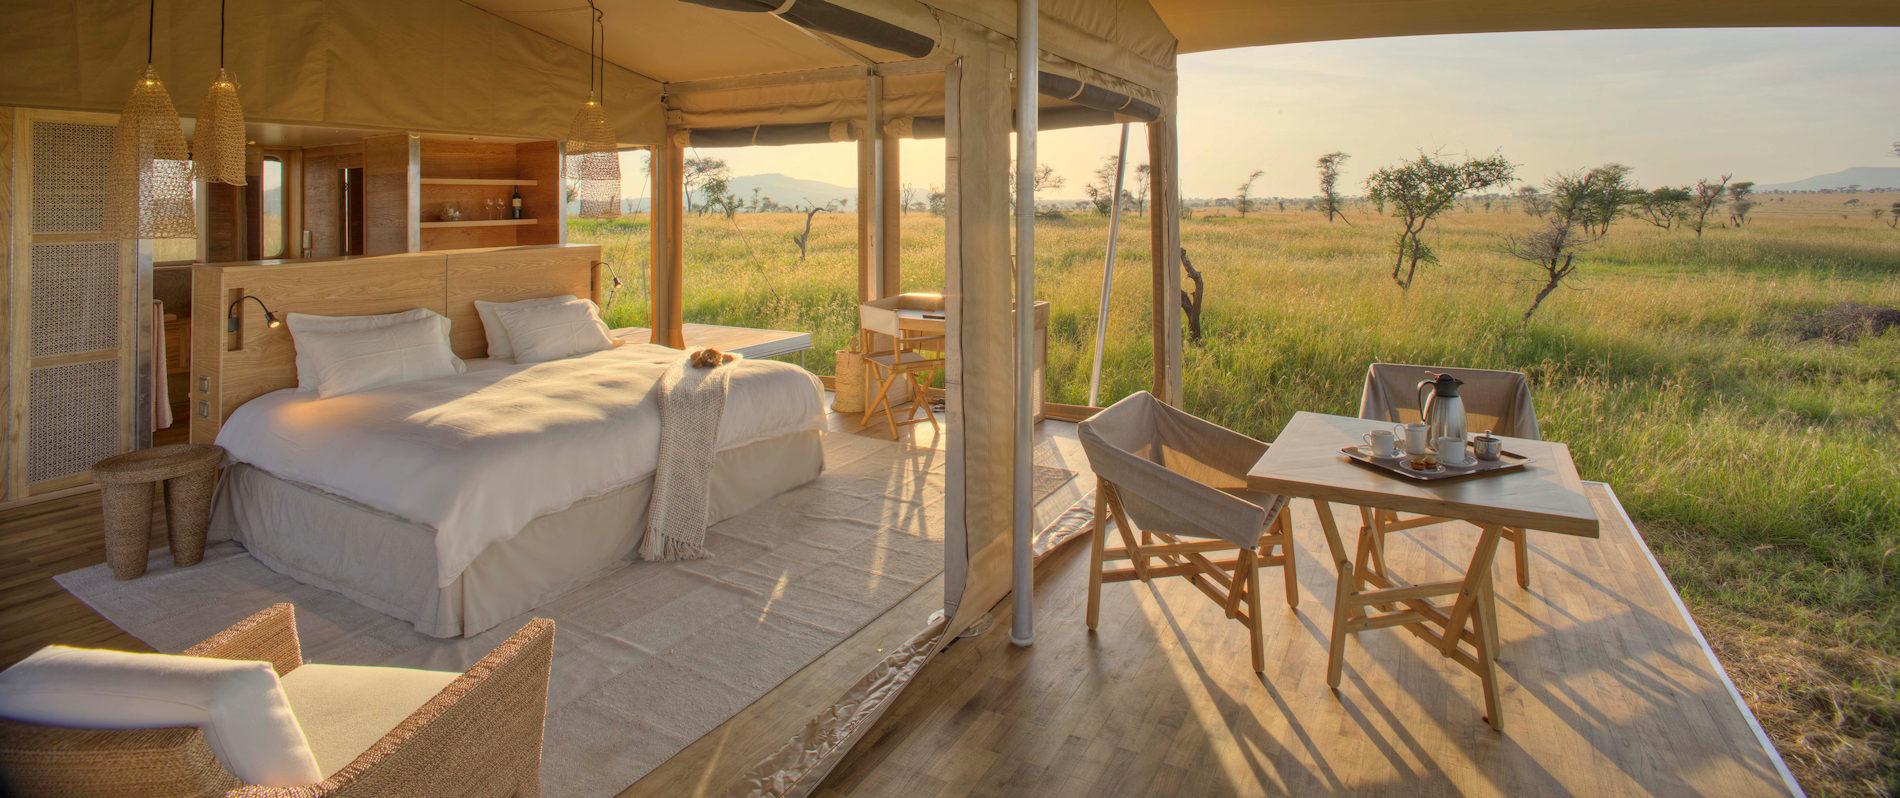 Schlafzimmer, Roving Bushtops Serengeti, Tansania